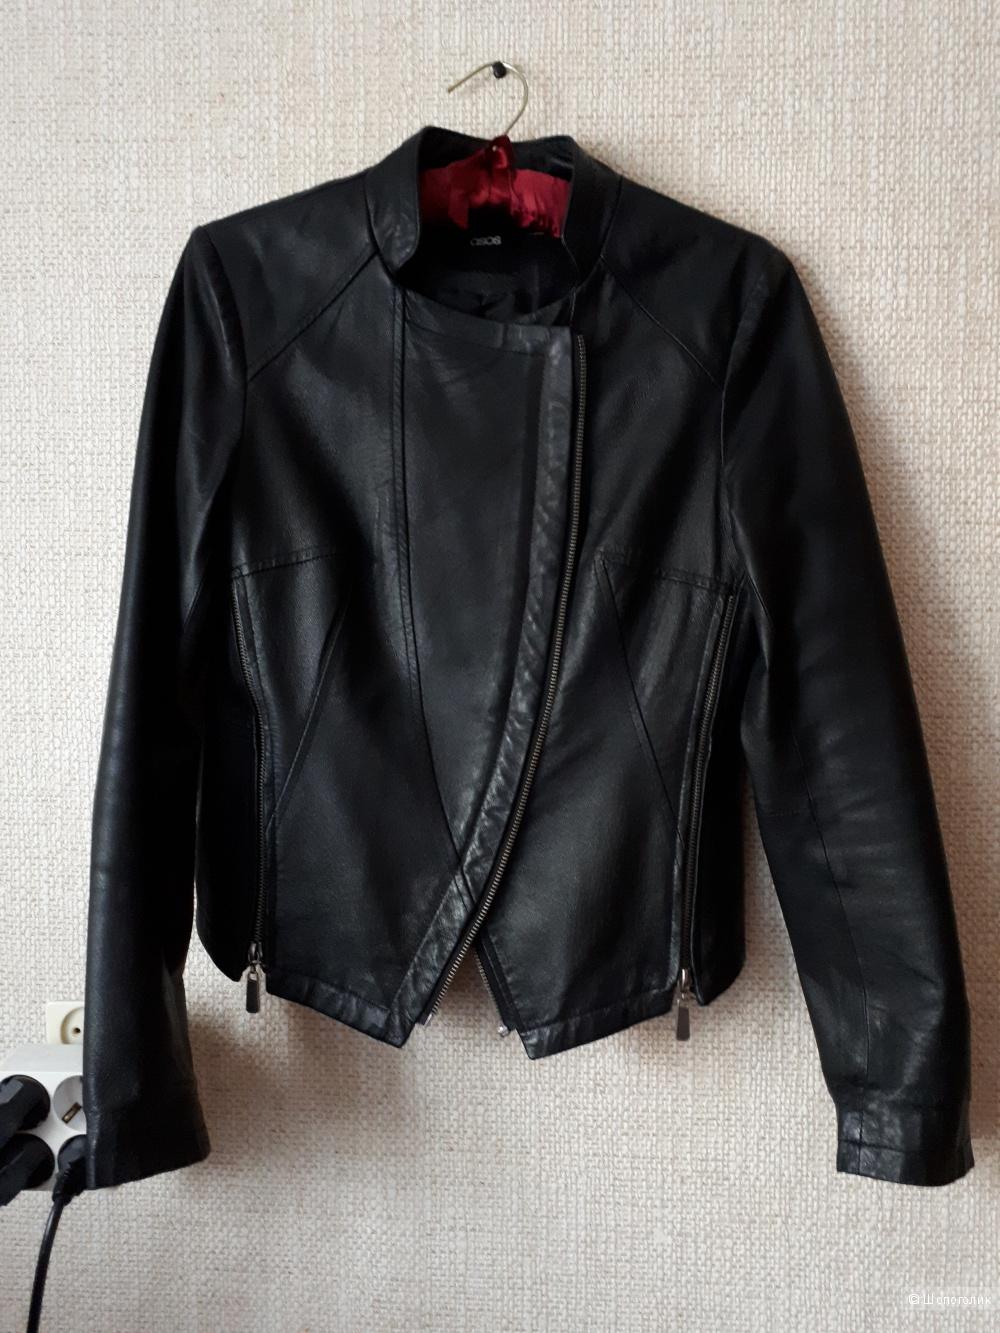 Сон кожаная куртка старая